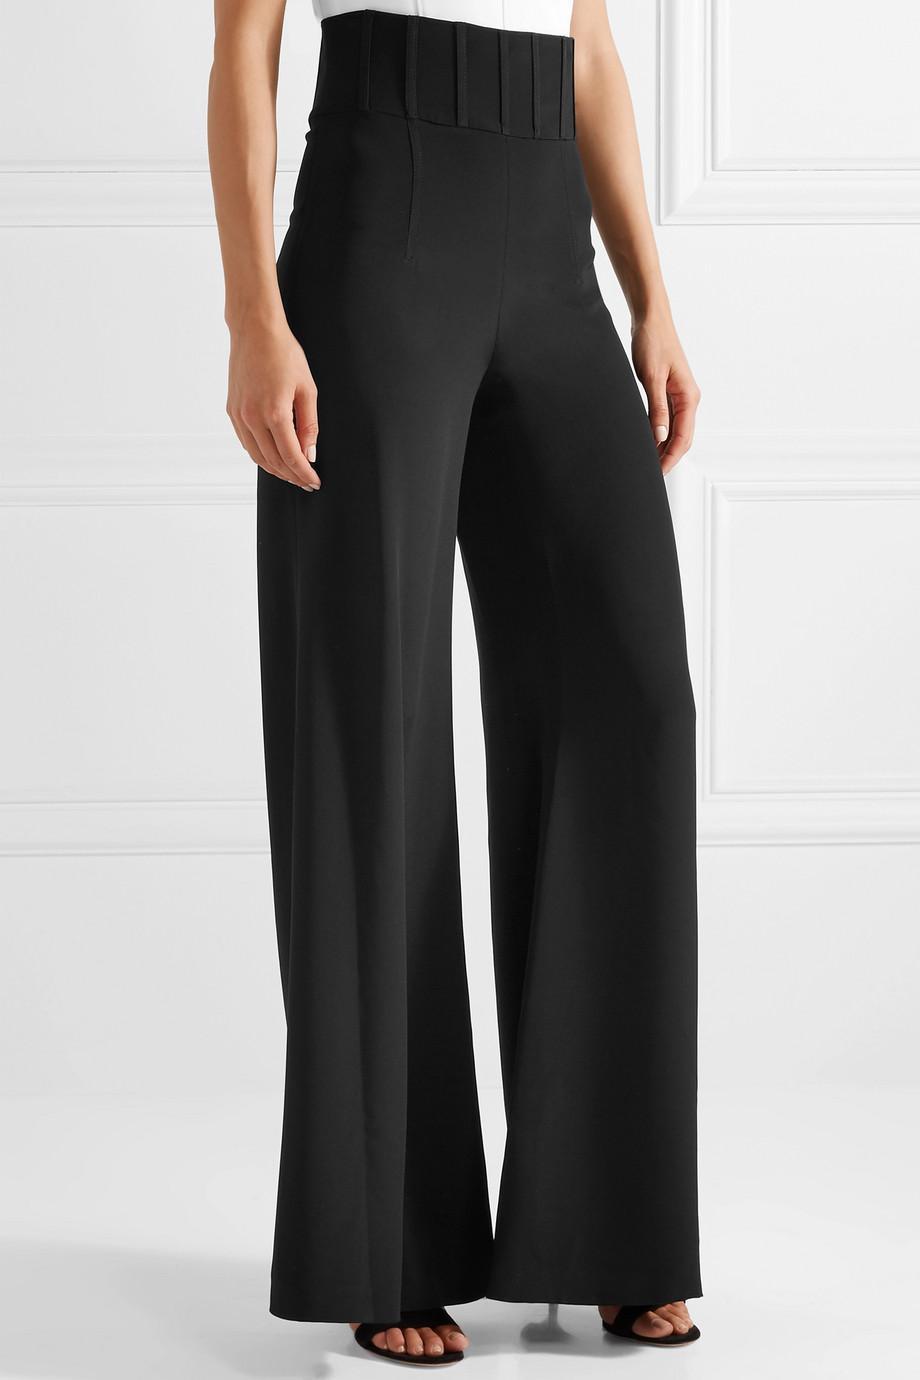 Jade Silk-crepe Wide-leg Pants - Black Cushnie et Ochs VgPqV50Gy8